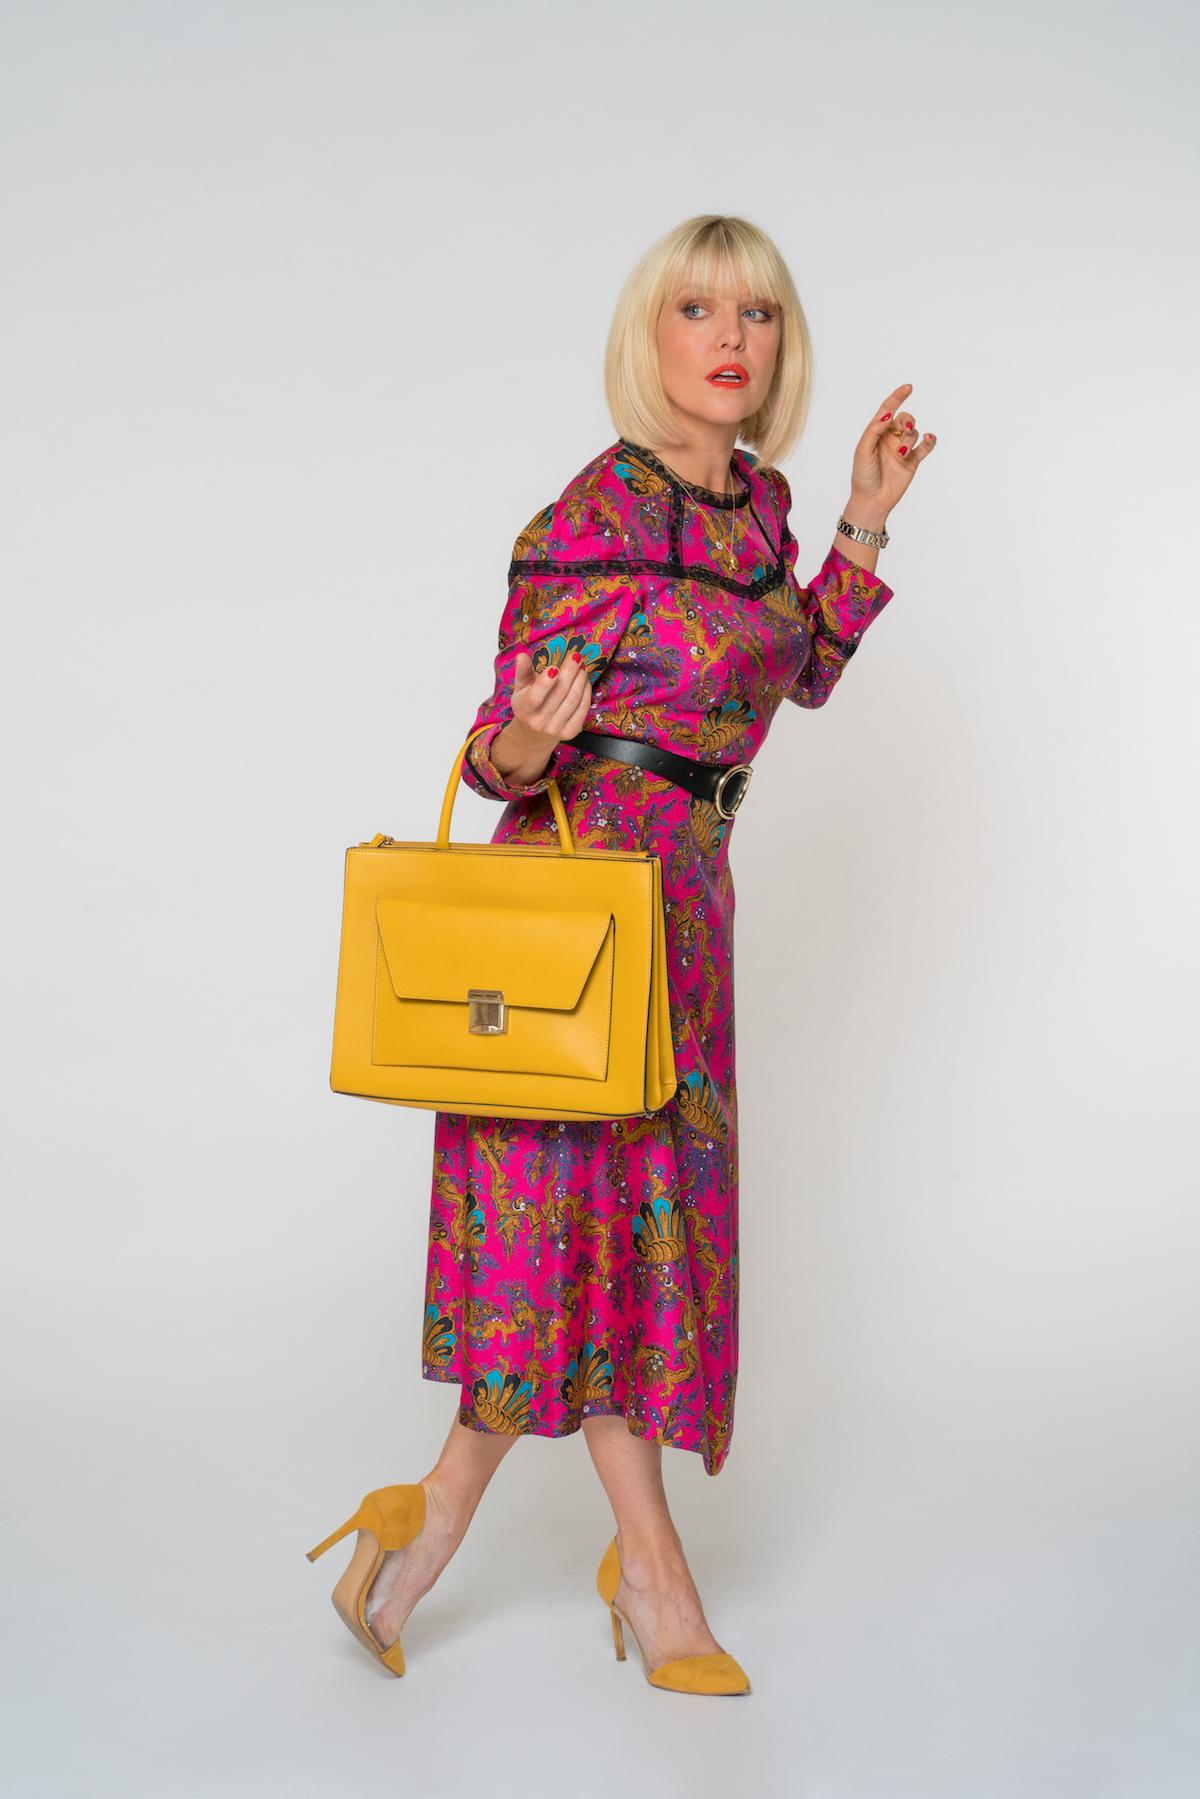 Ashley Jensen as Agatha Raisin